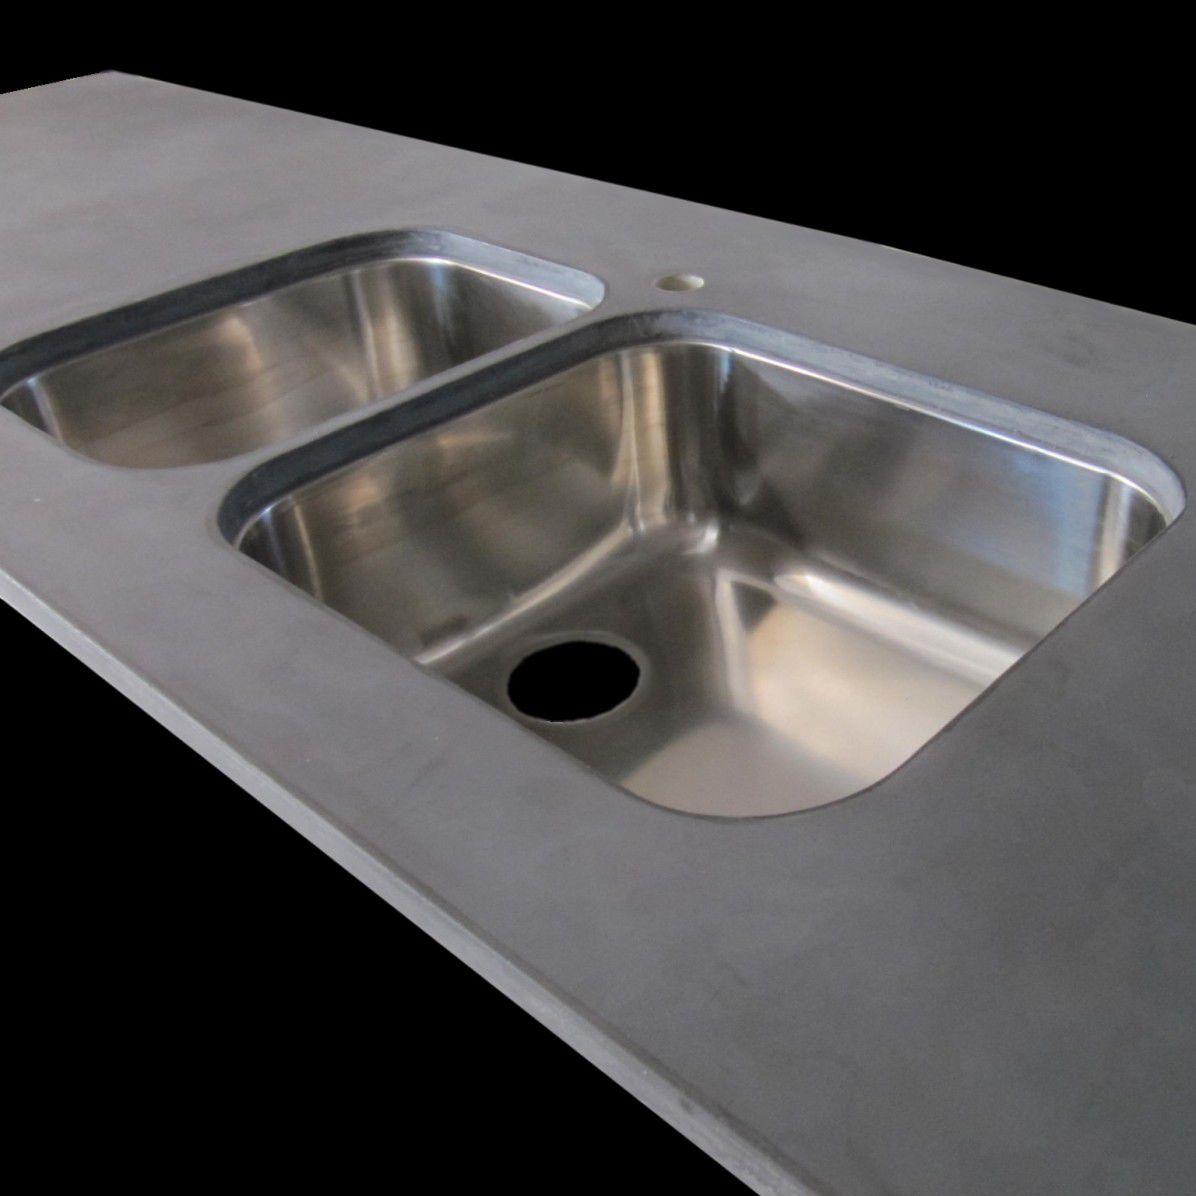 kitchen sink rack update cabinets 双槽厨房水槽 不锈钢 带有沥水架 balian beton atelier